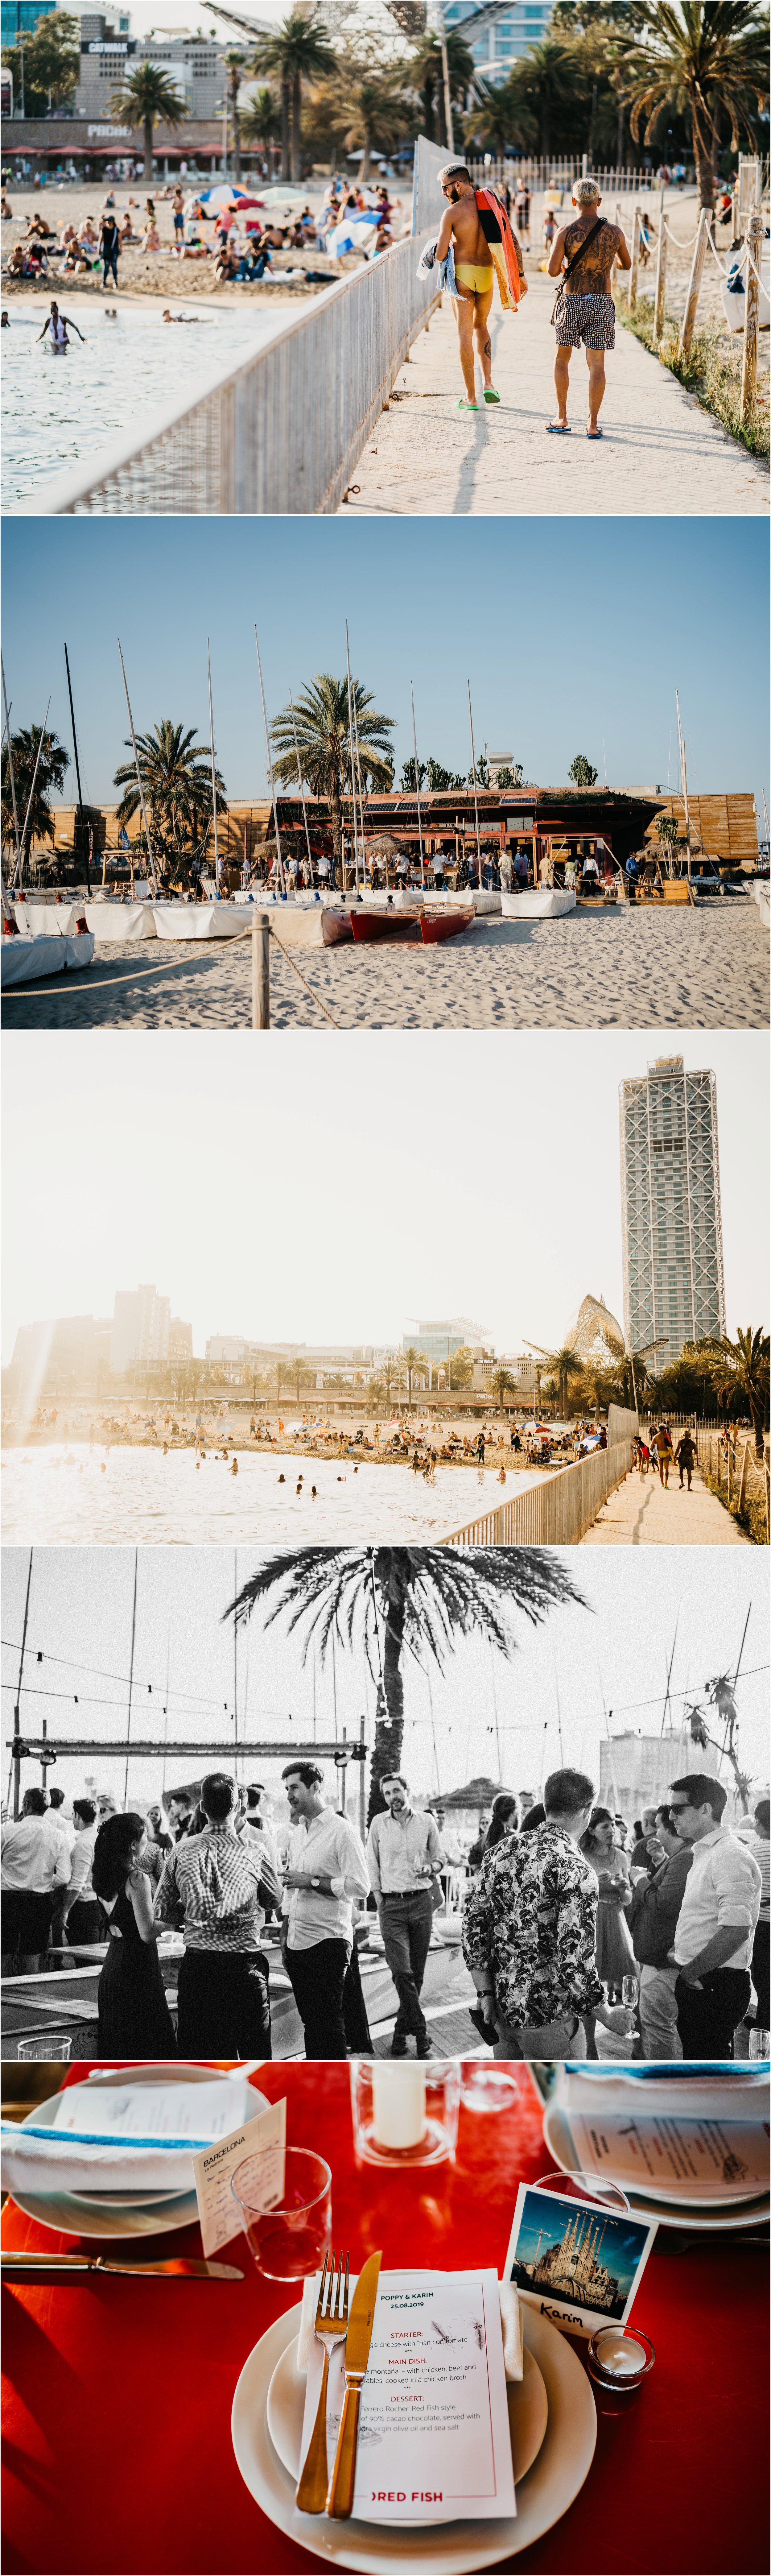 Barcelona Spain destination wedding photographer_0129.jpg